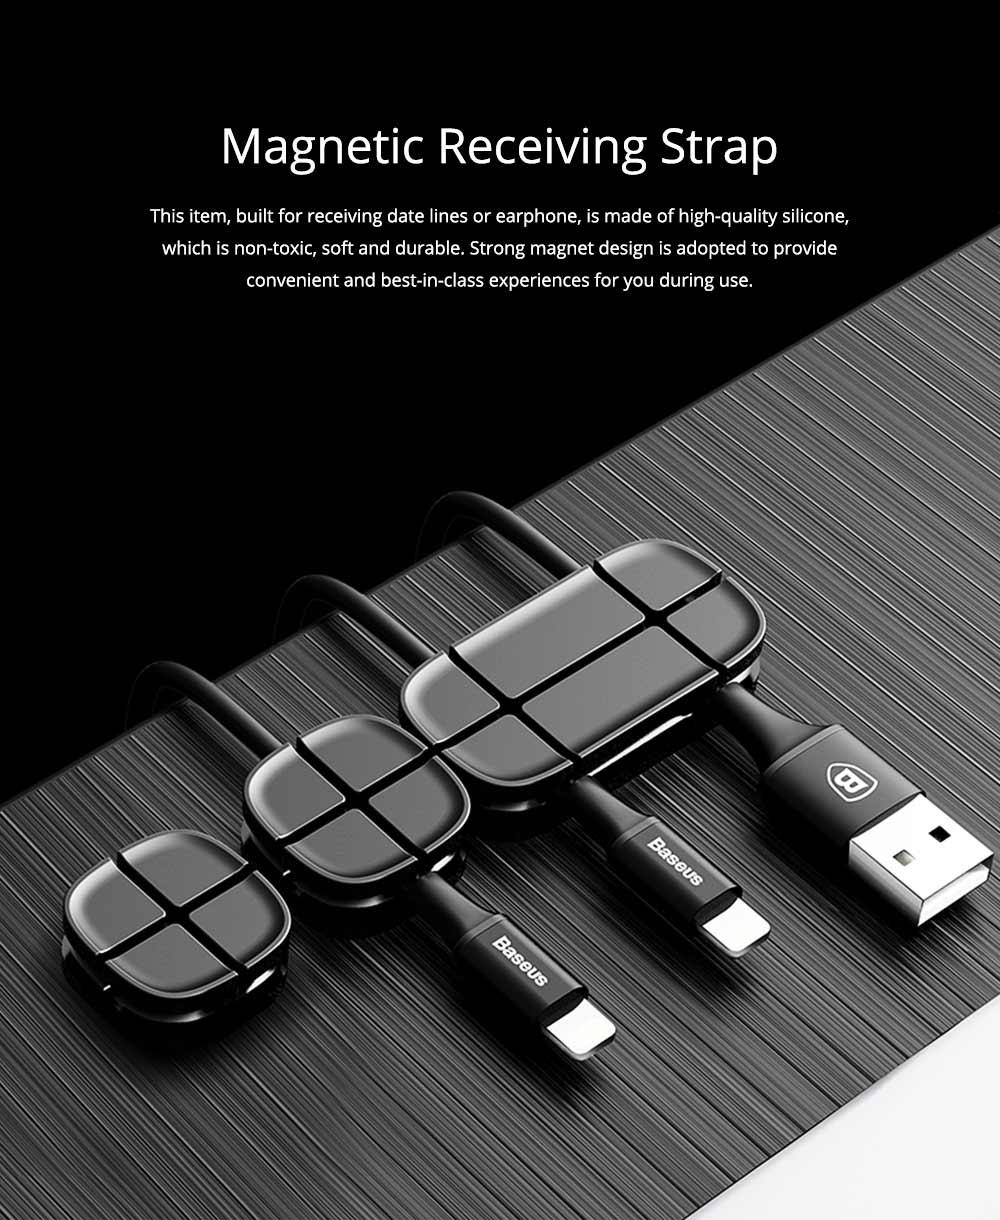 Ultrasoft Silicone Cross Cruciform Model Wire Data Line Earphone Organizer, Flexible Desktop Wire Holder Clamp Management 0